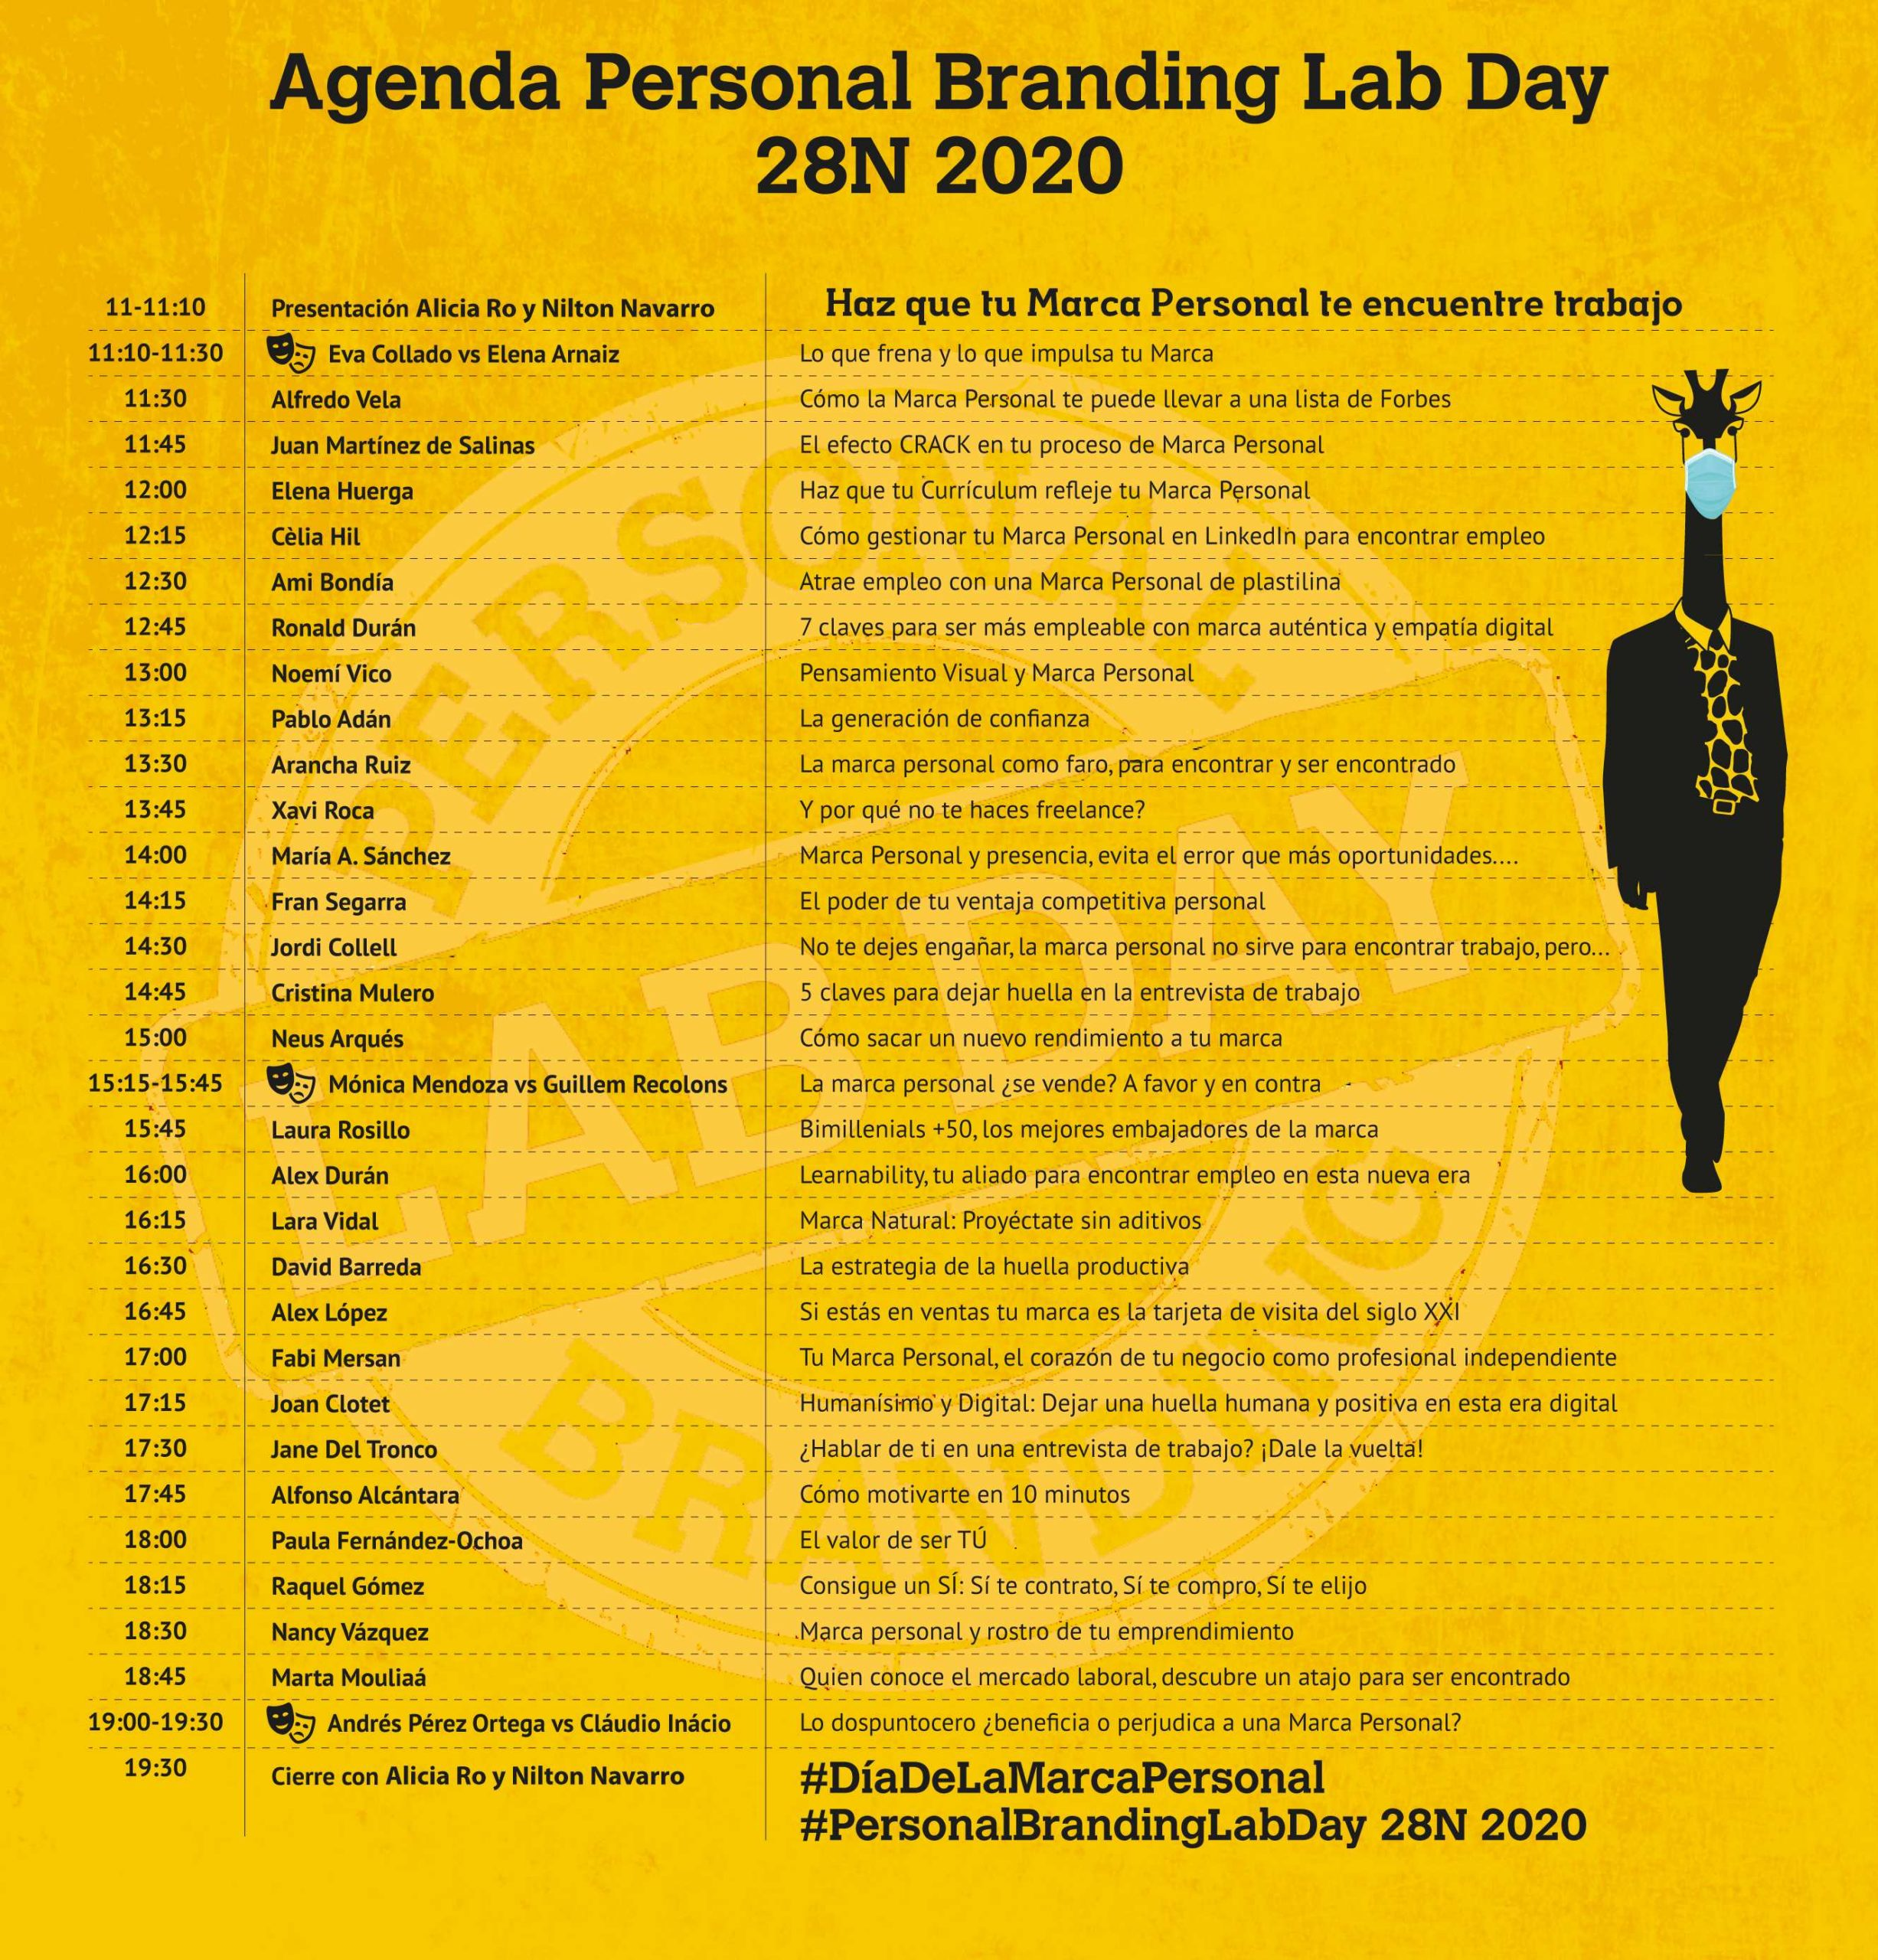 Agenda 28N Personal Branding lab Day 2020